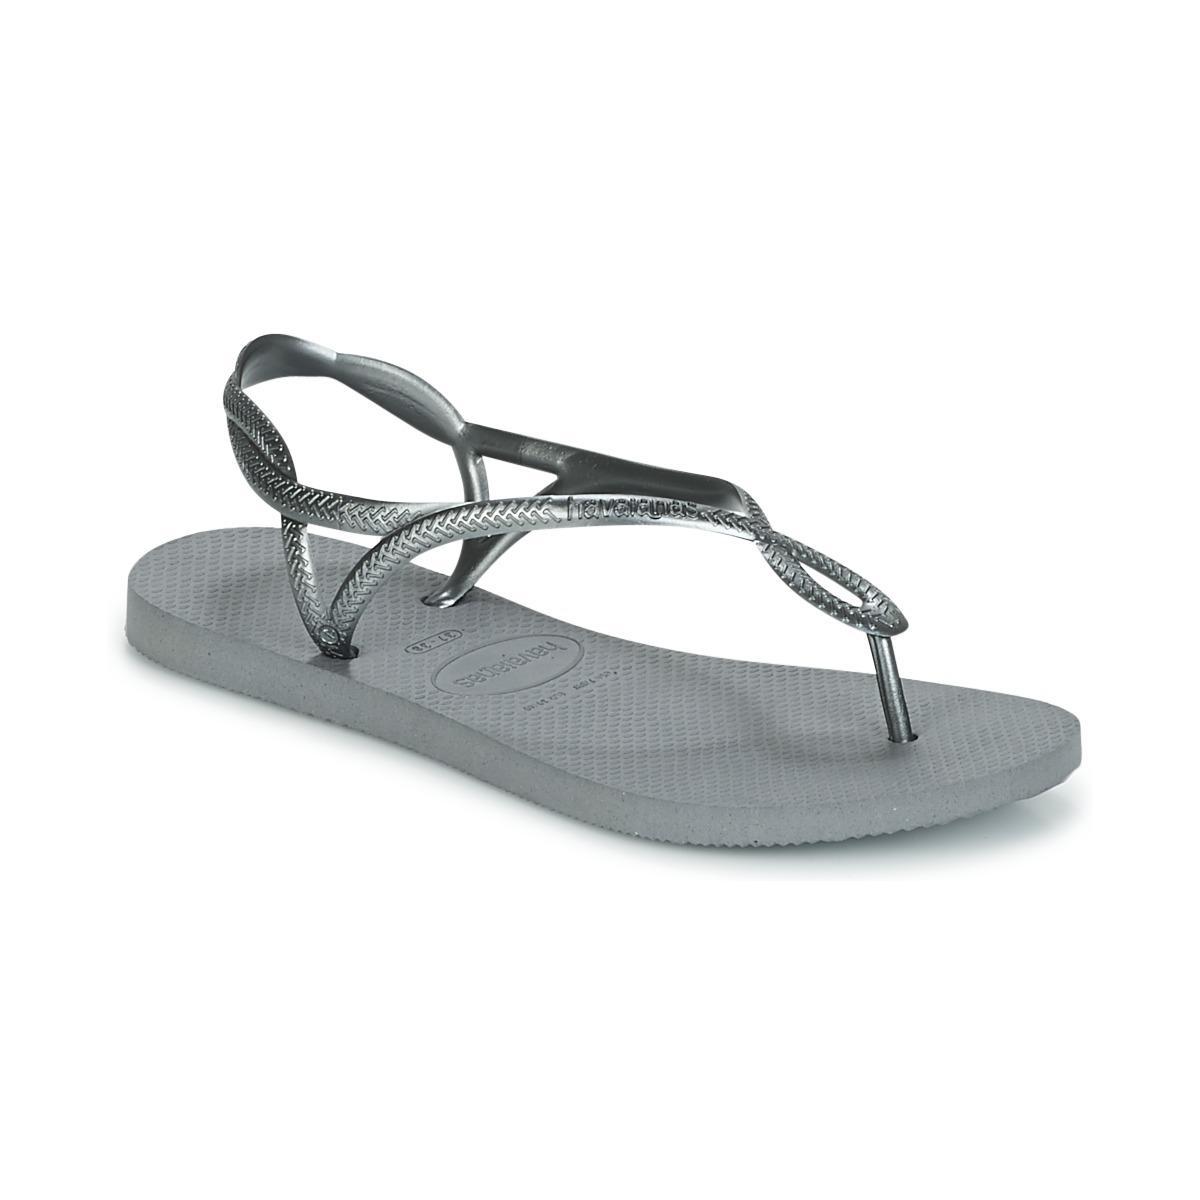 b09d390208afa5 Havaianas. Metallic Luna Women s Flip Flops   Sandals (shoes) In Silver